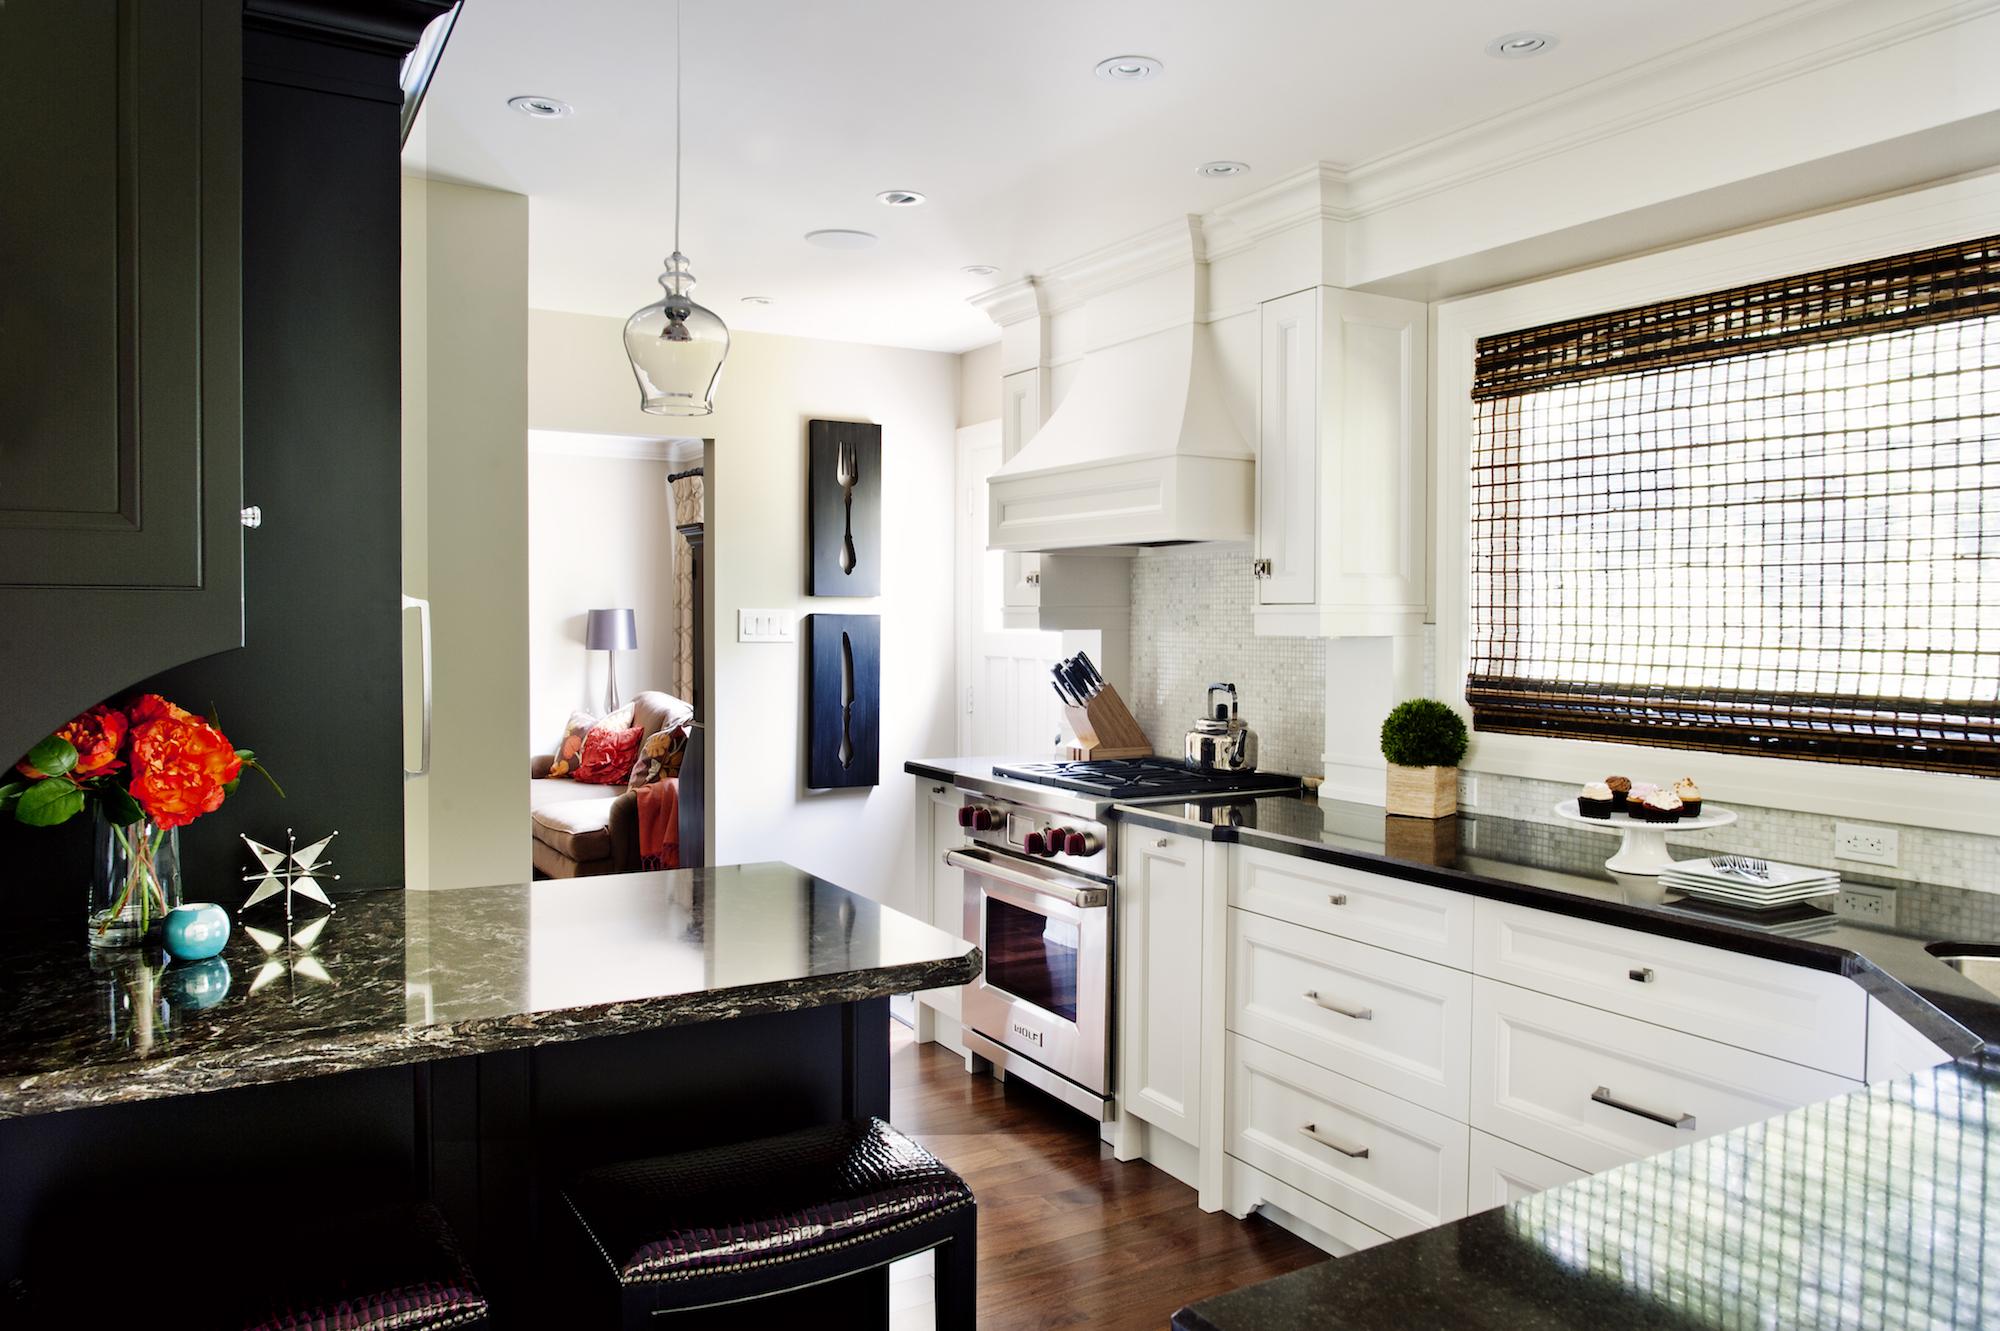 9- Pizzale Design Interior Decorating white millwork quartz counter .jpg